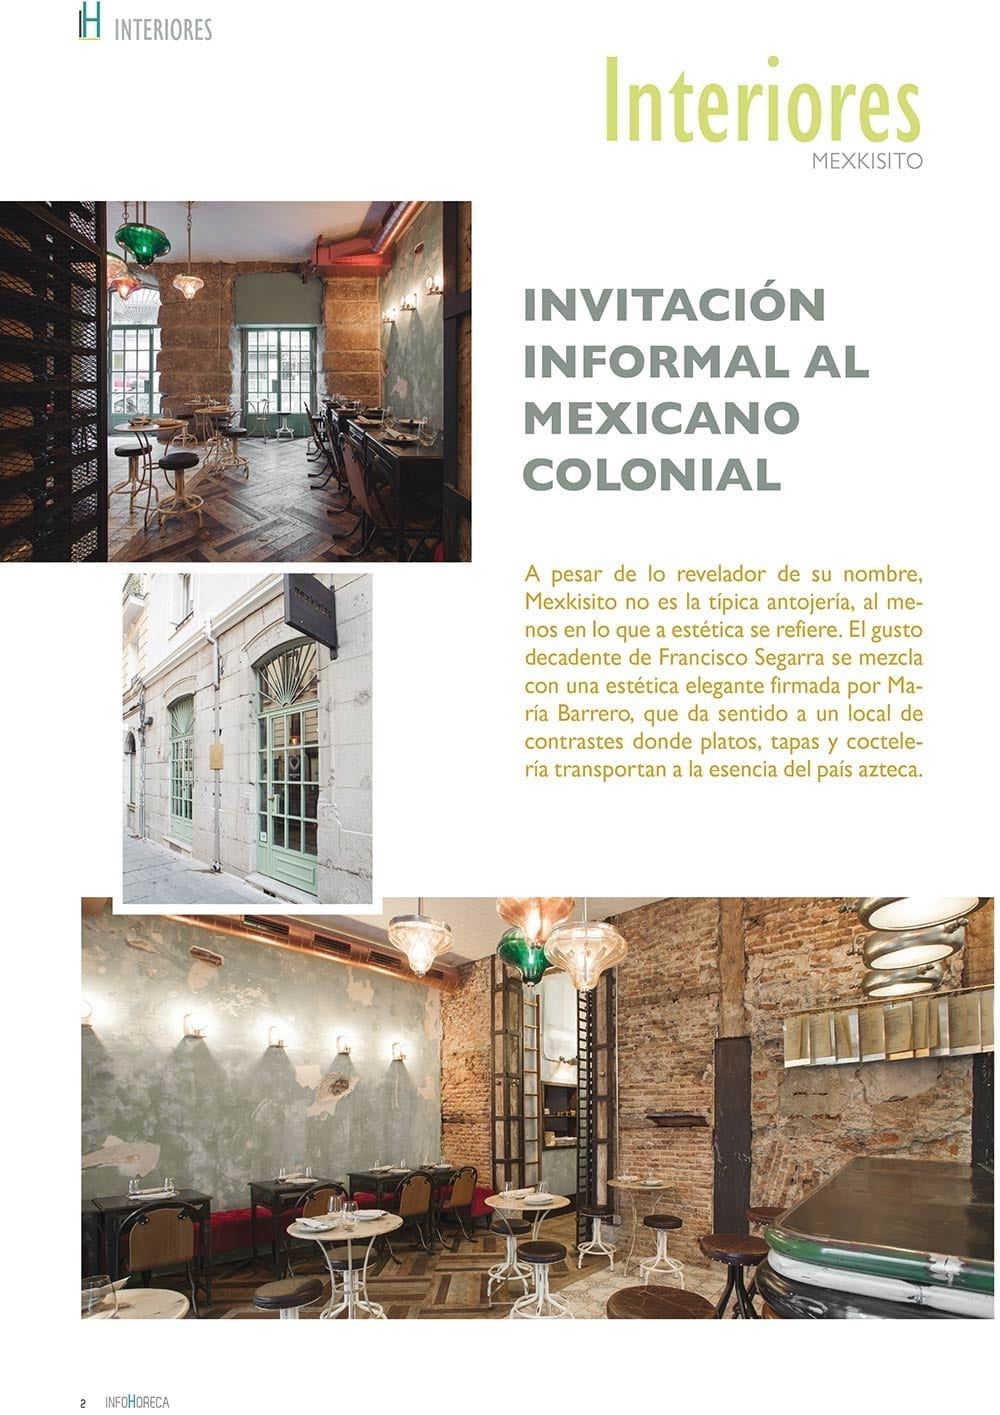 Mexkisito en interiores InfoHoreca.